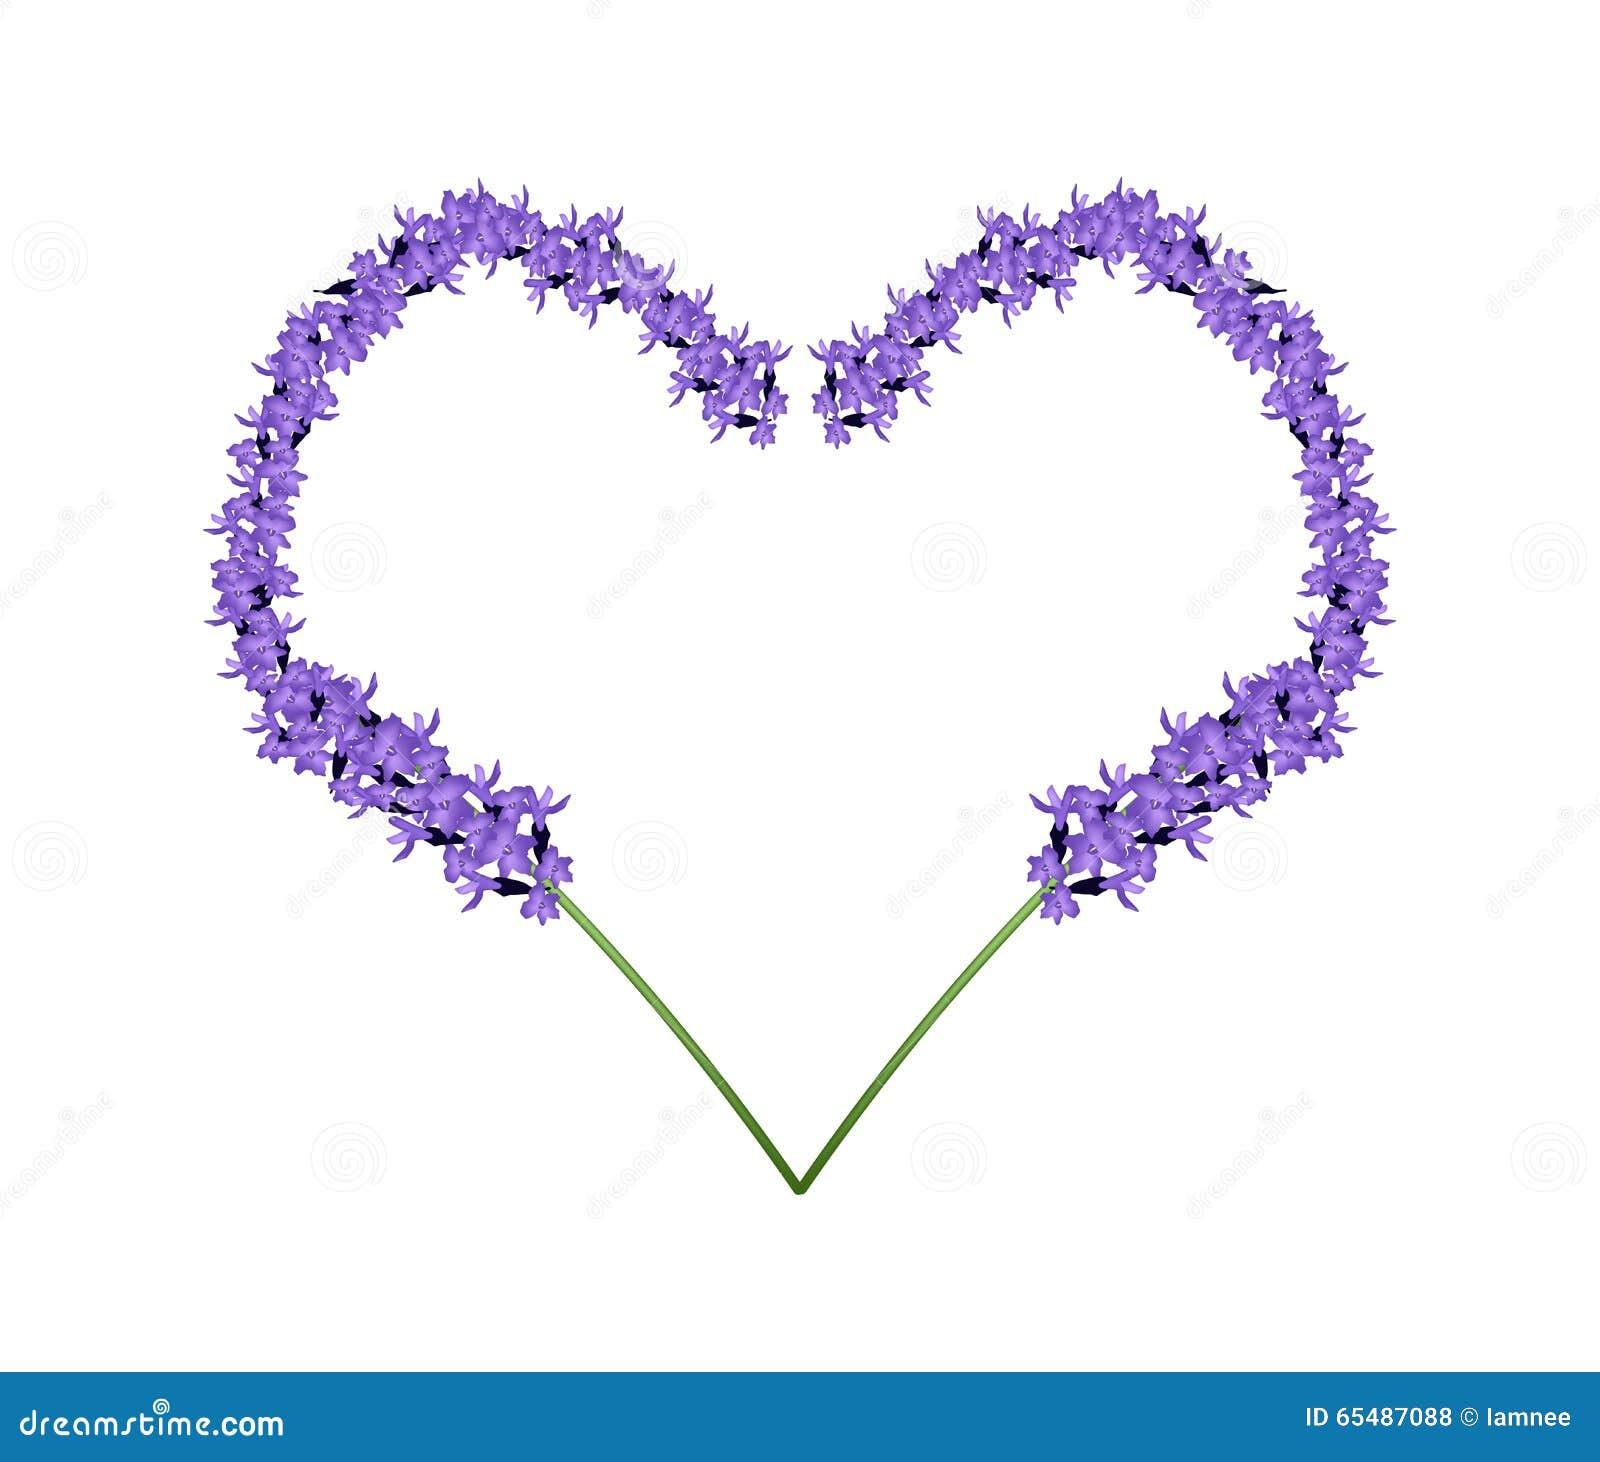 Purpurrote Lavendel-Blumen Im Herz-Form-Rahmen Vektor Abbildung ...